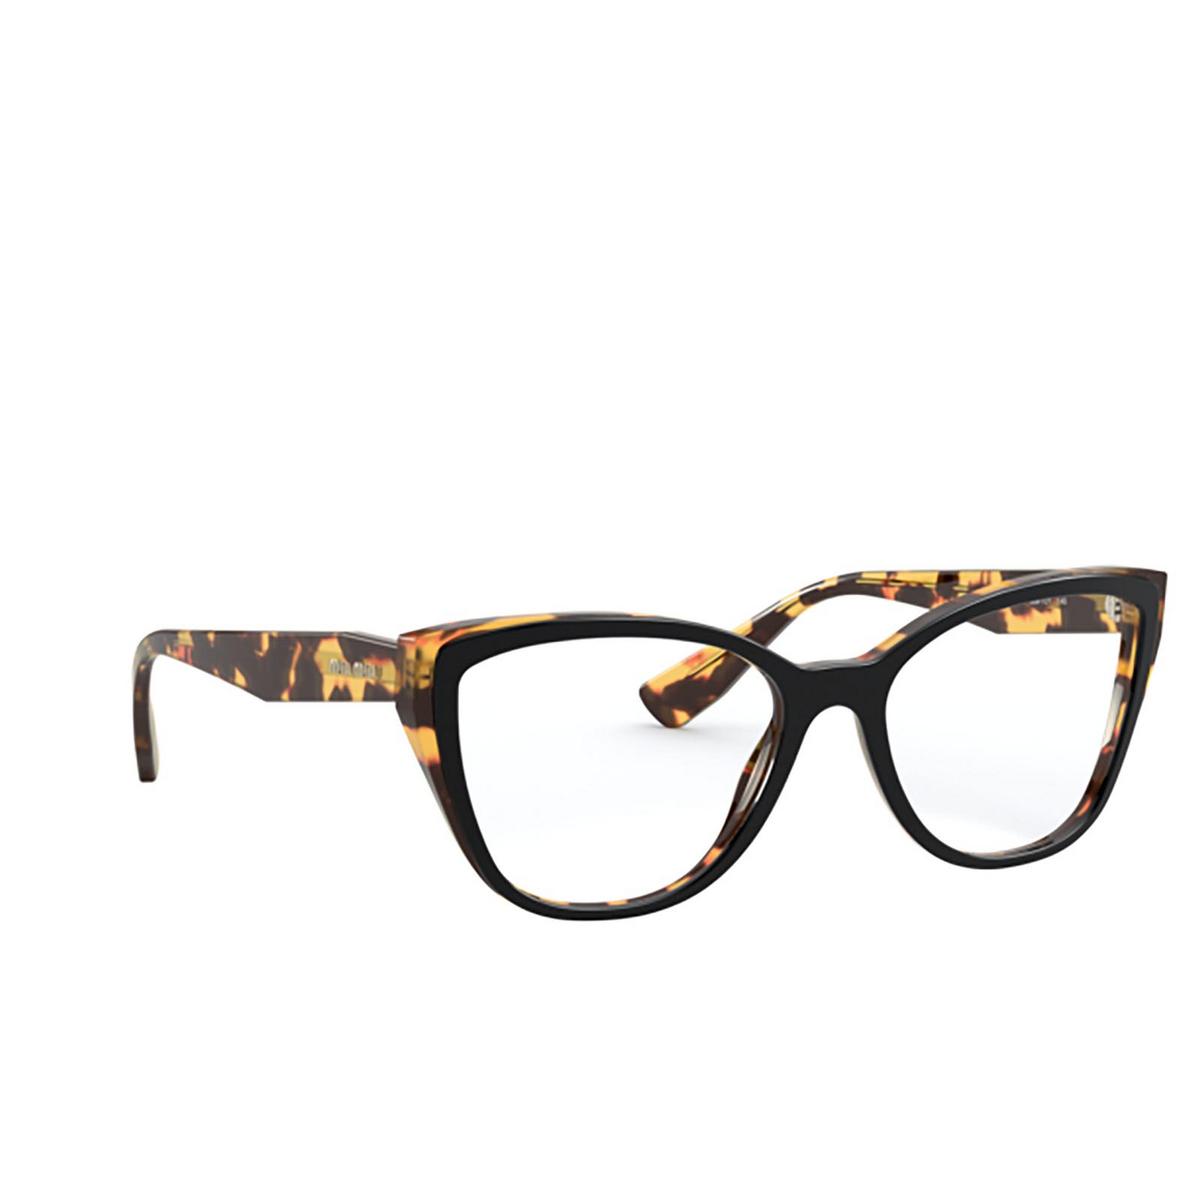 Miu Miu® Butterfly Eyeglasses: Core Collection MU 04SV color Top Black / Light Havana 3891O1 - three-quarters view.